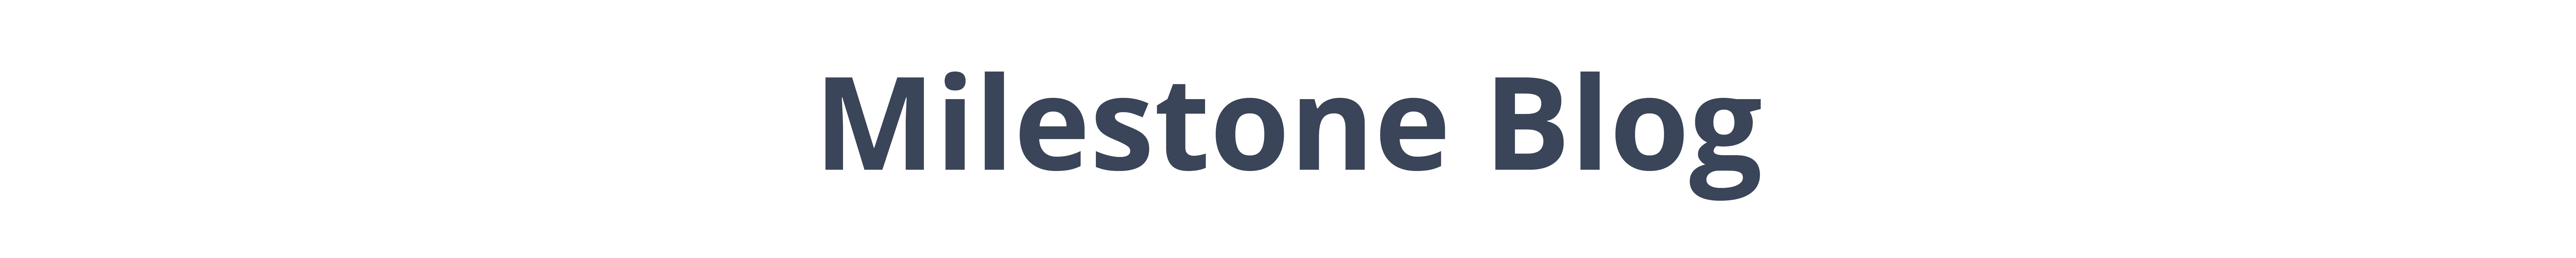 Milestone blog logo for Preston Greens in Lexington, Kentucky